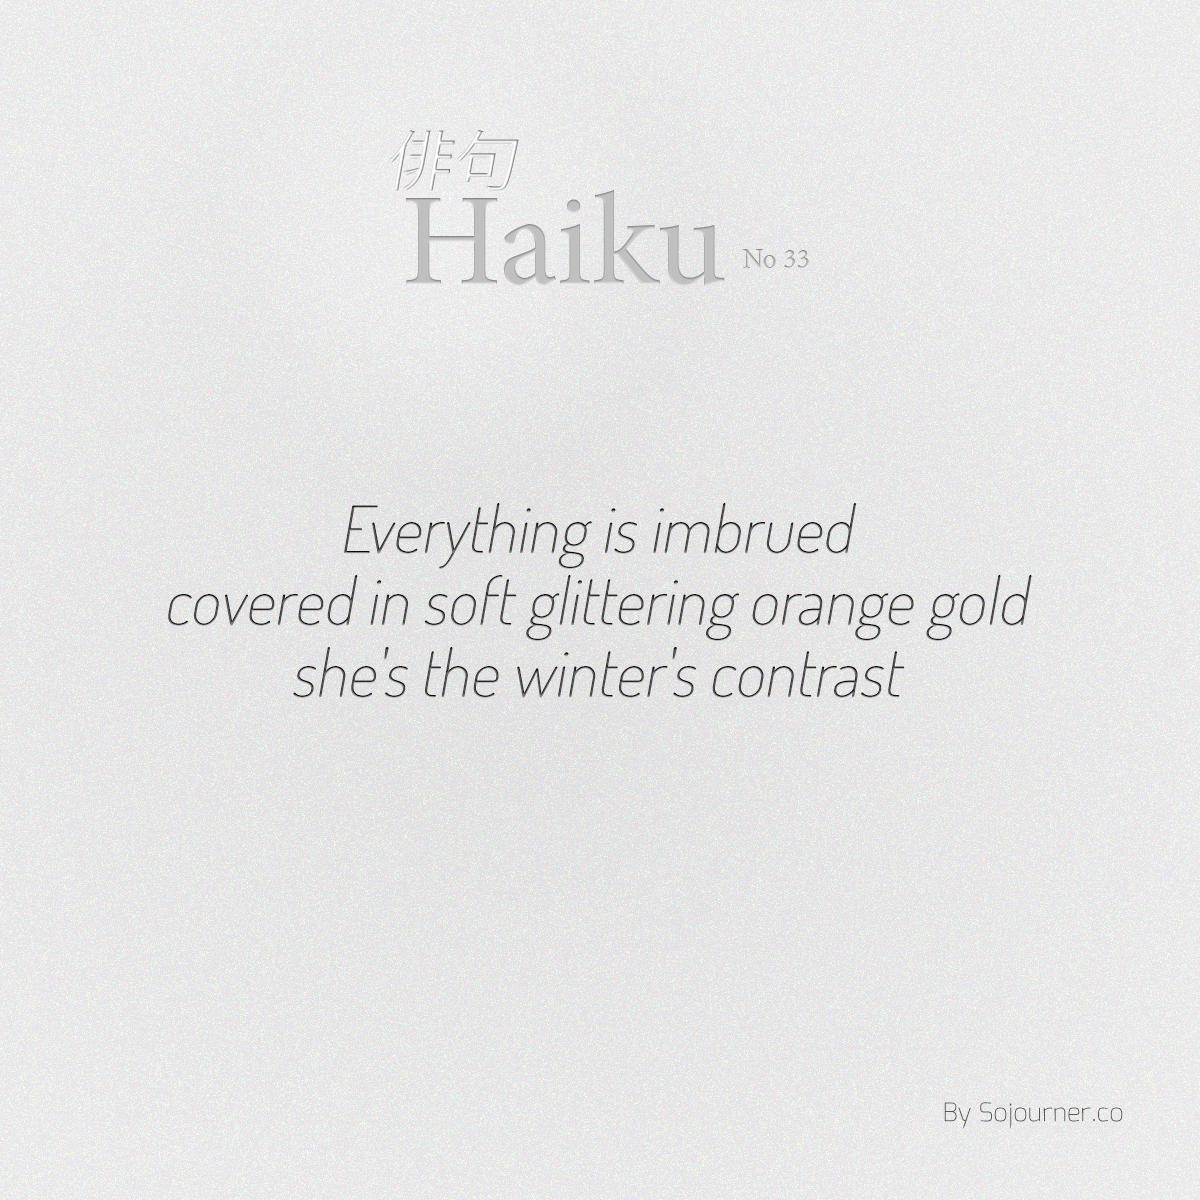 indefiniteloop.com - Haiku No. 33 - Winter's Contrast.